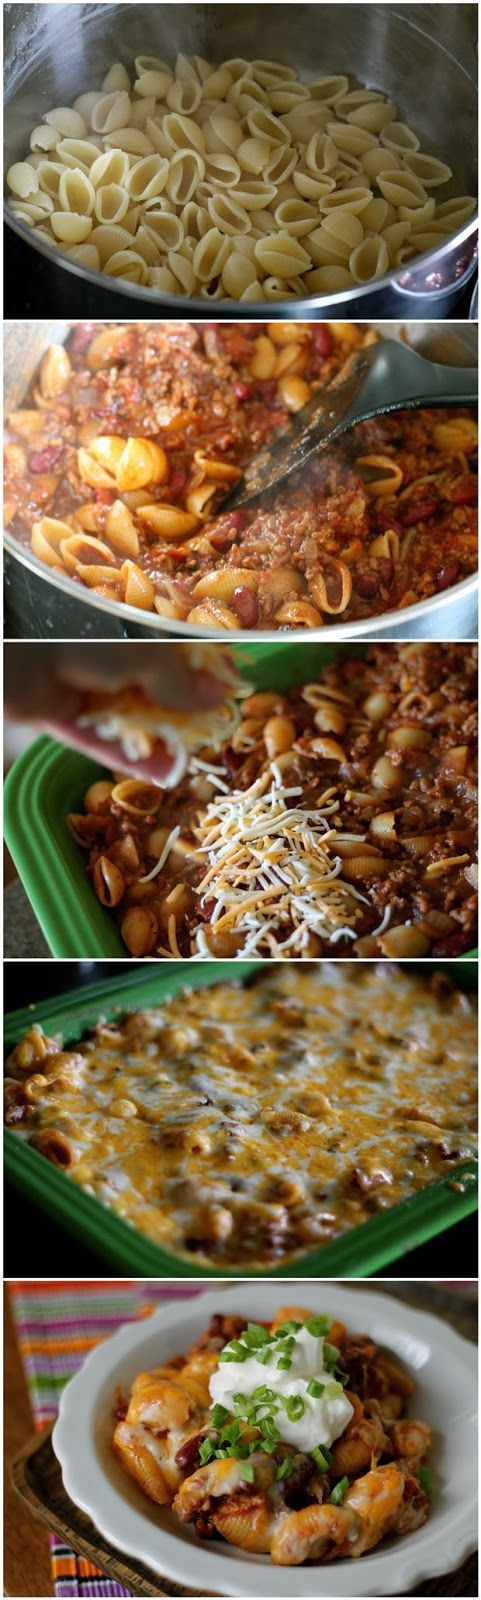 Chili Pasta Bake Recipe